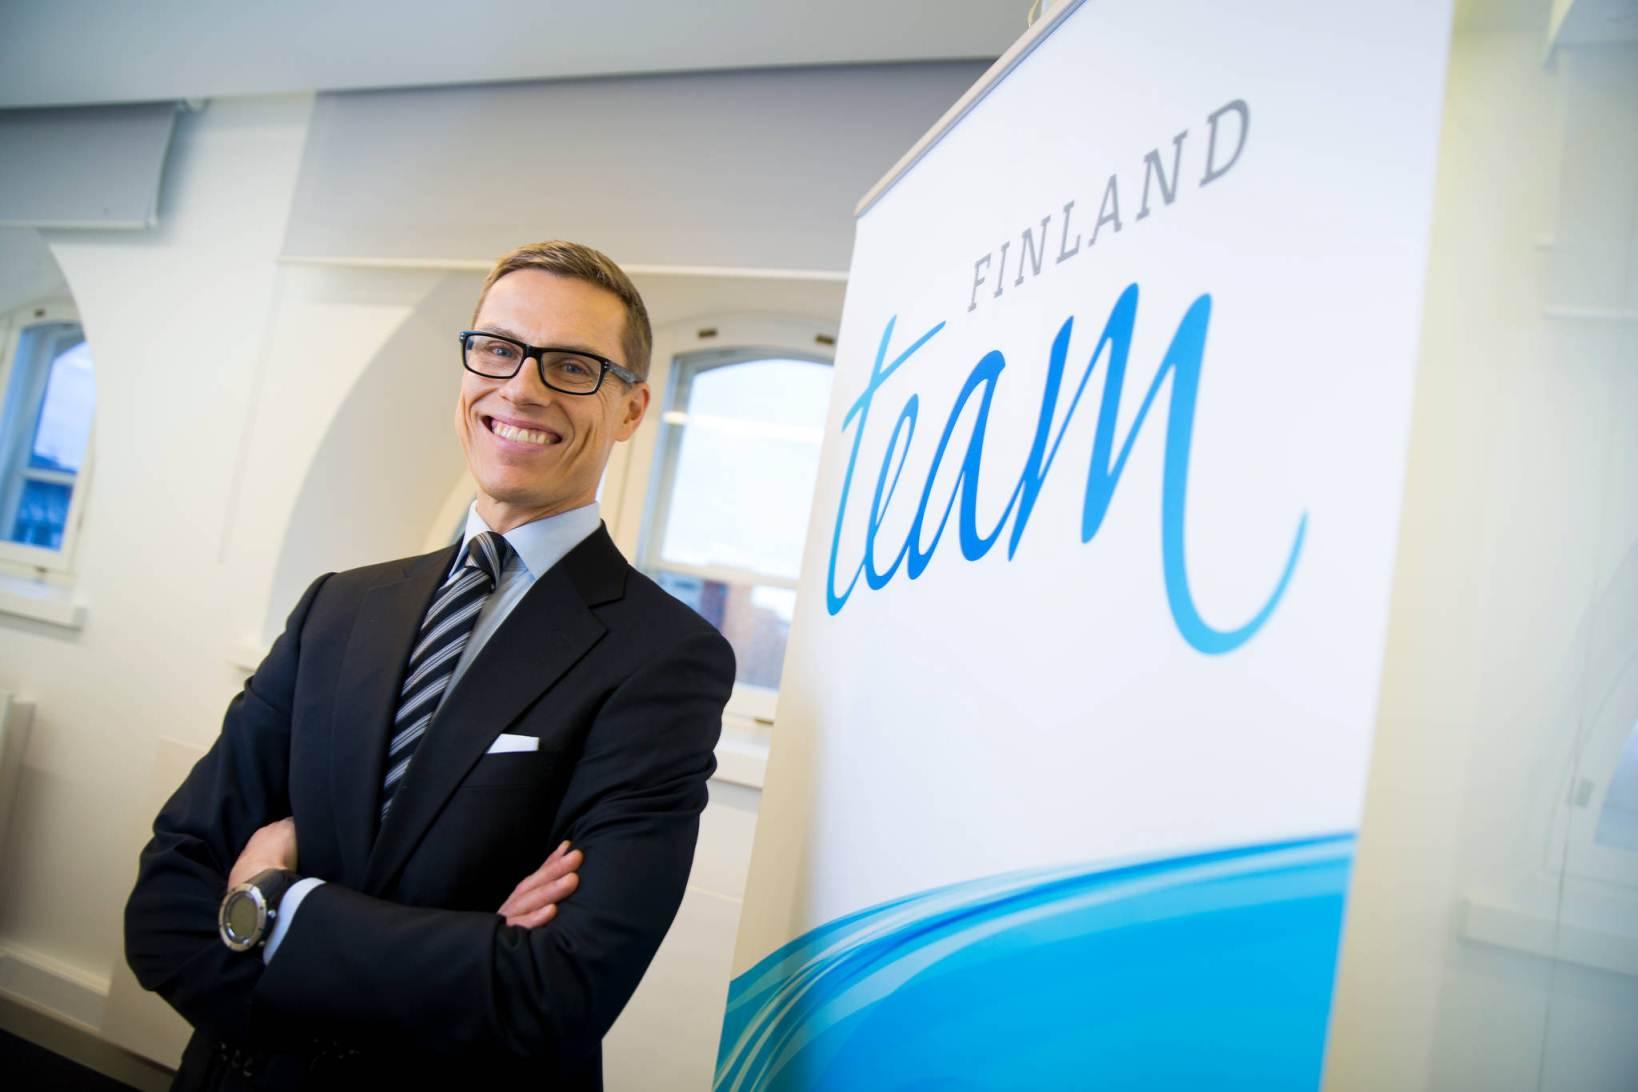 Finnish official treats Russian threat 'like dandruff'